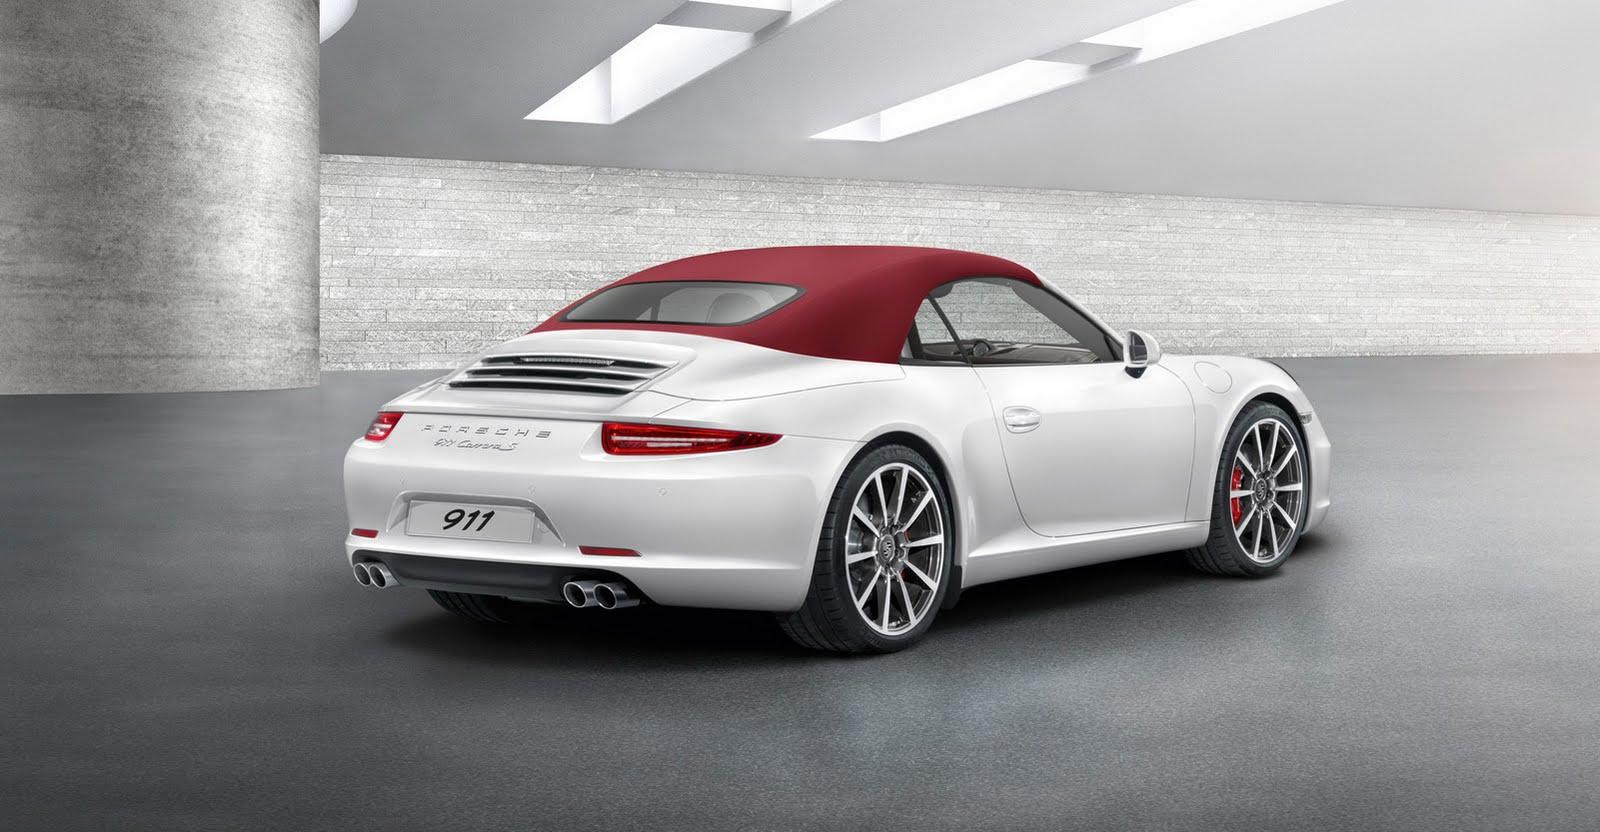 2012 porsche 911 carrera cabriolet price 97 300. Black Bedroom Furniture Sets. Home Design Ideas